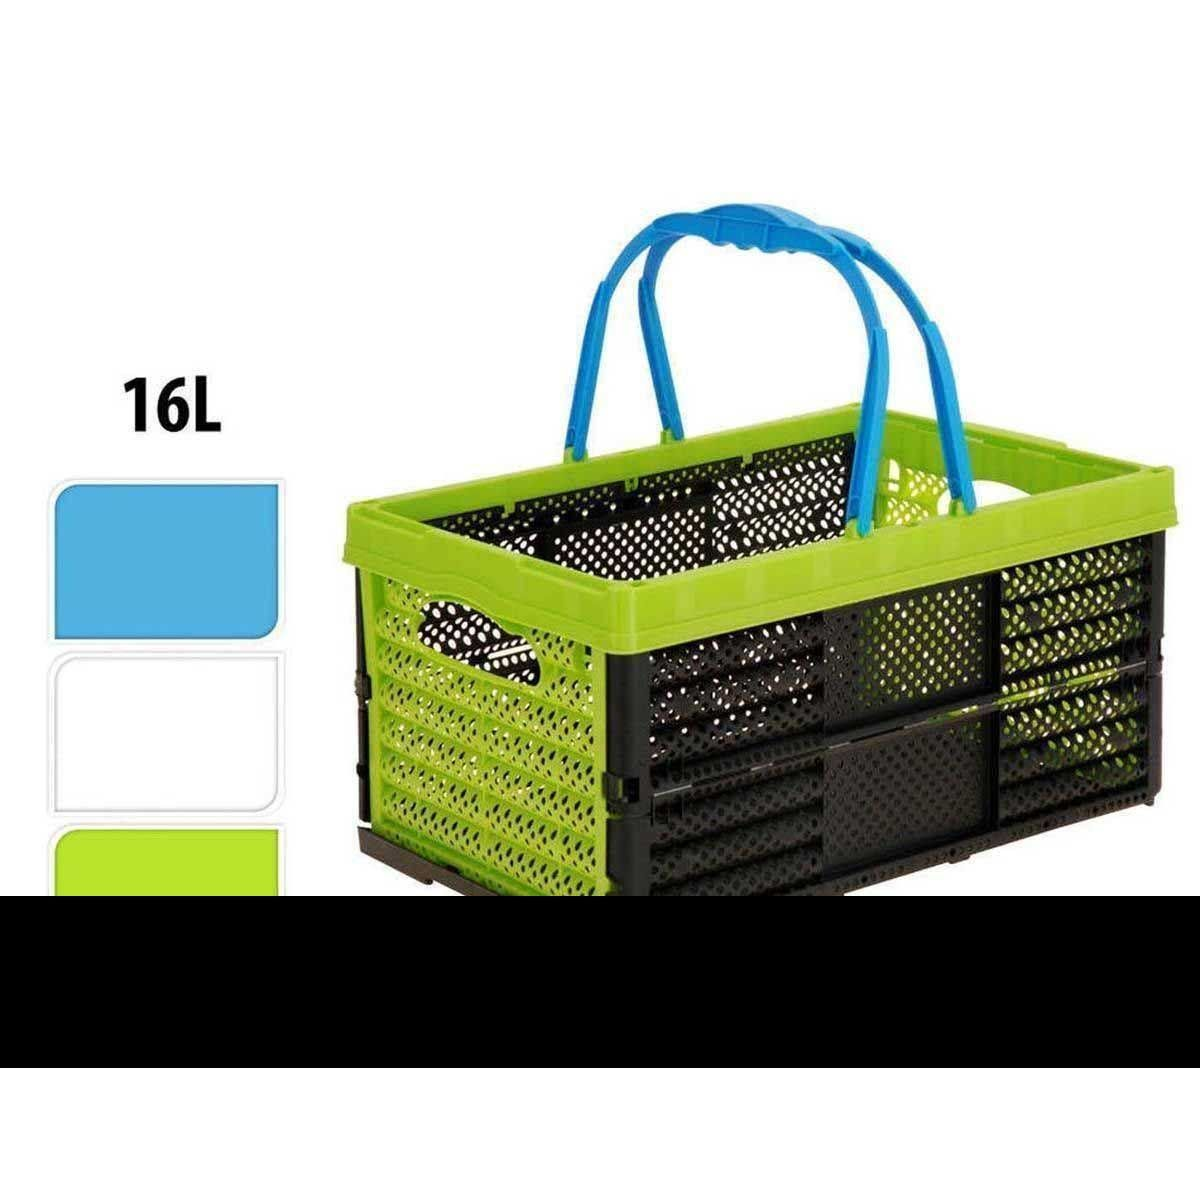 collapsible folding 16l plastic storage shopping basket box